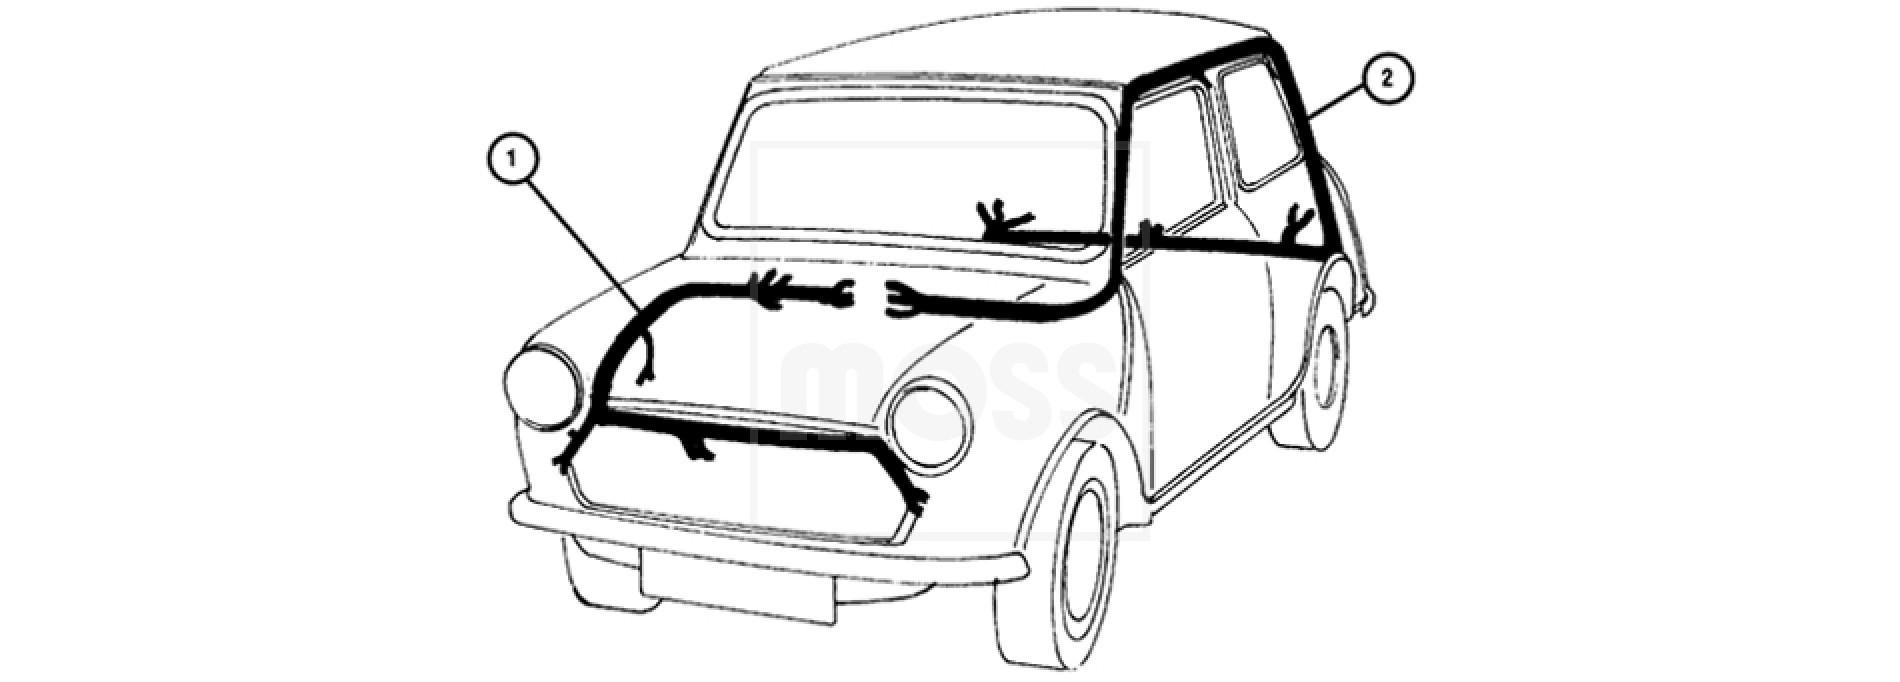 hight resolution of classic mini wiring diagram